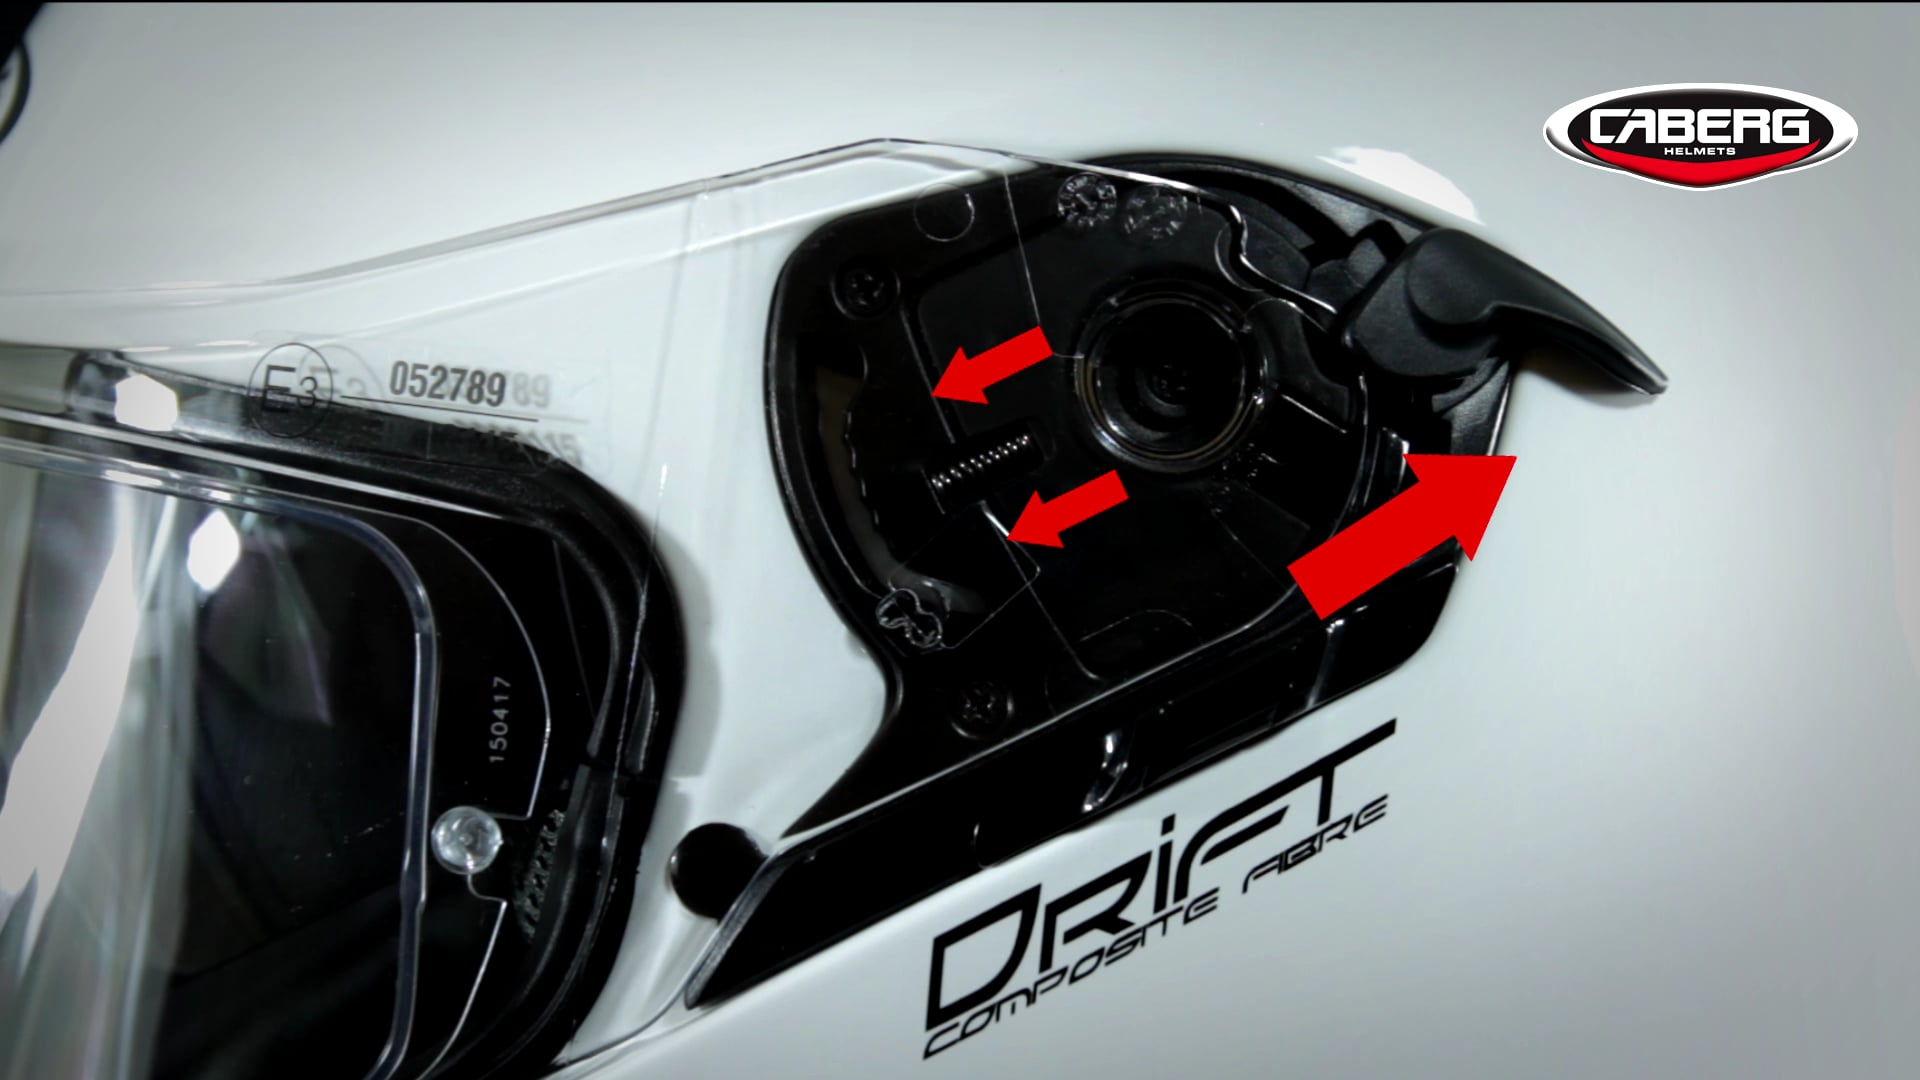 Drift Helmet by Caberg